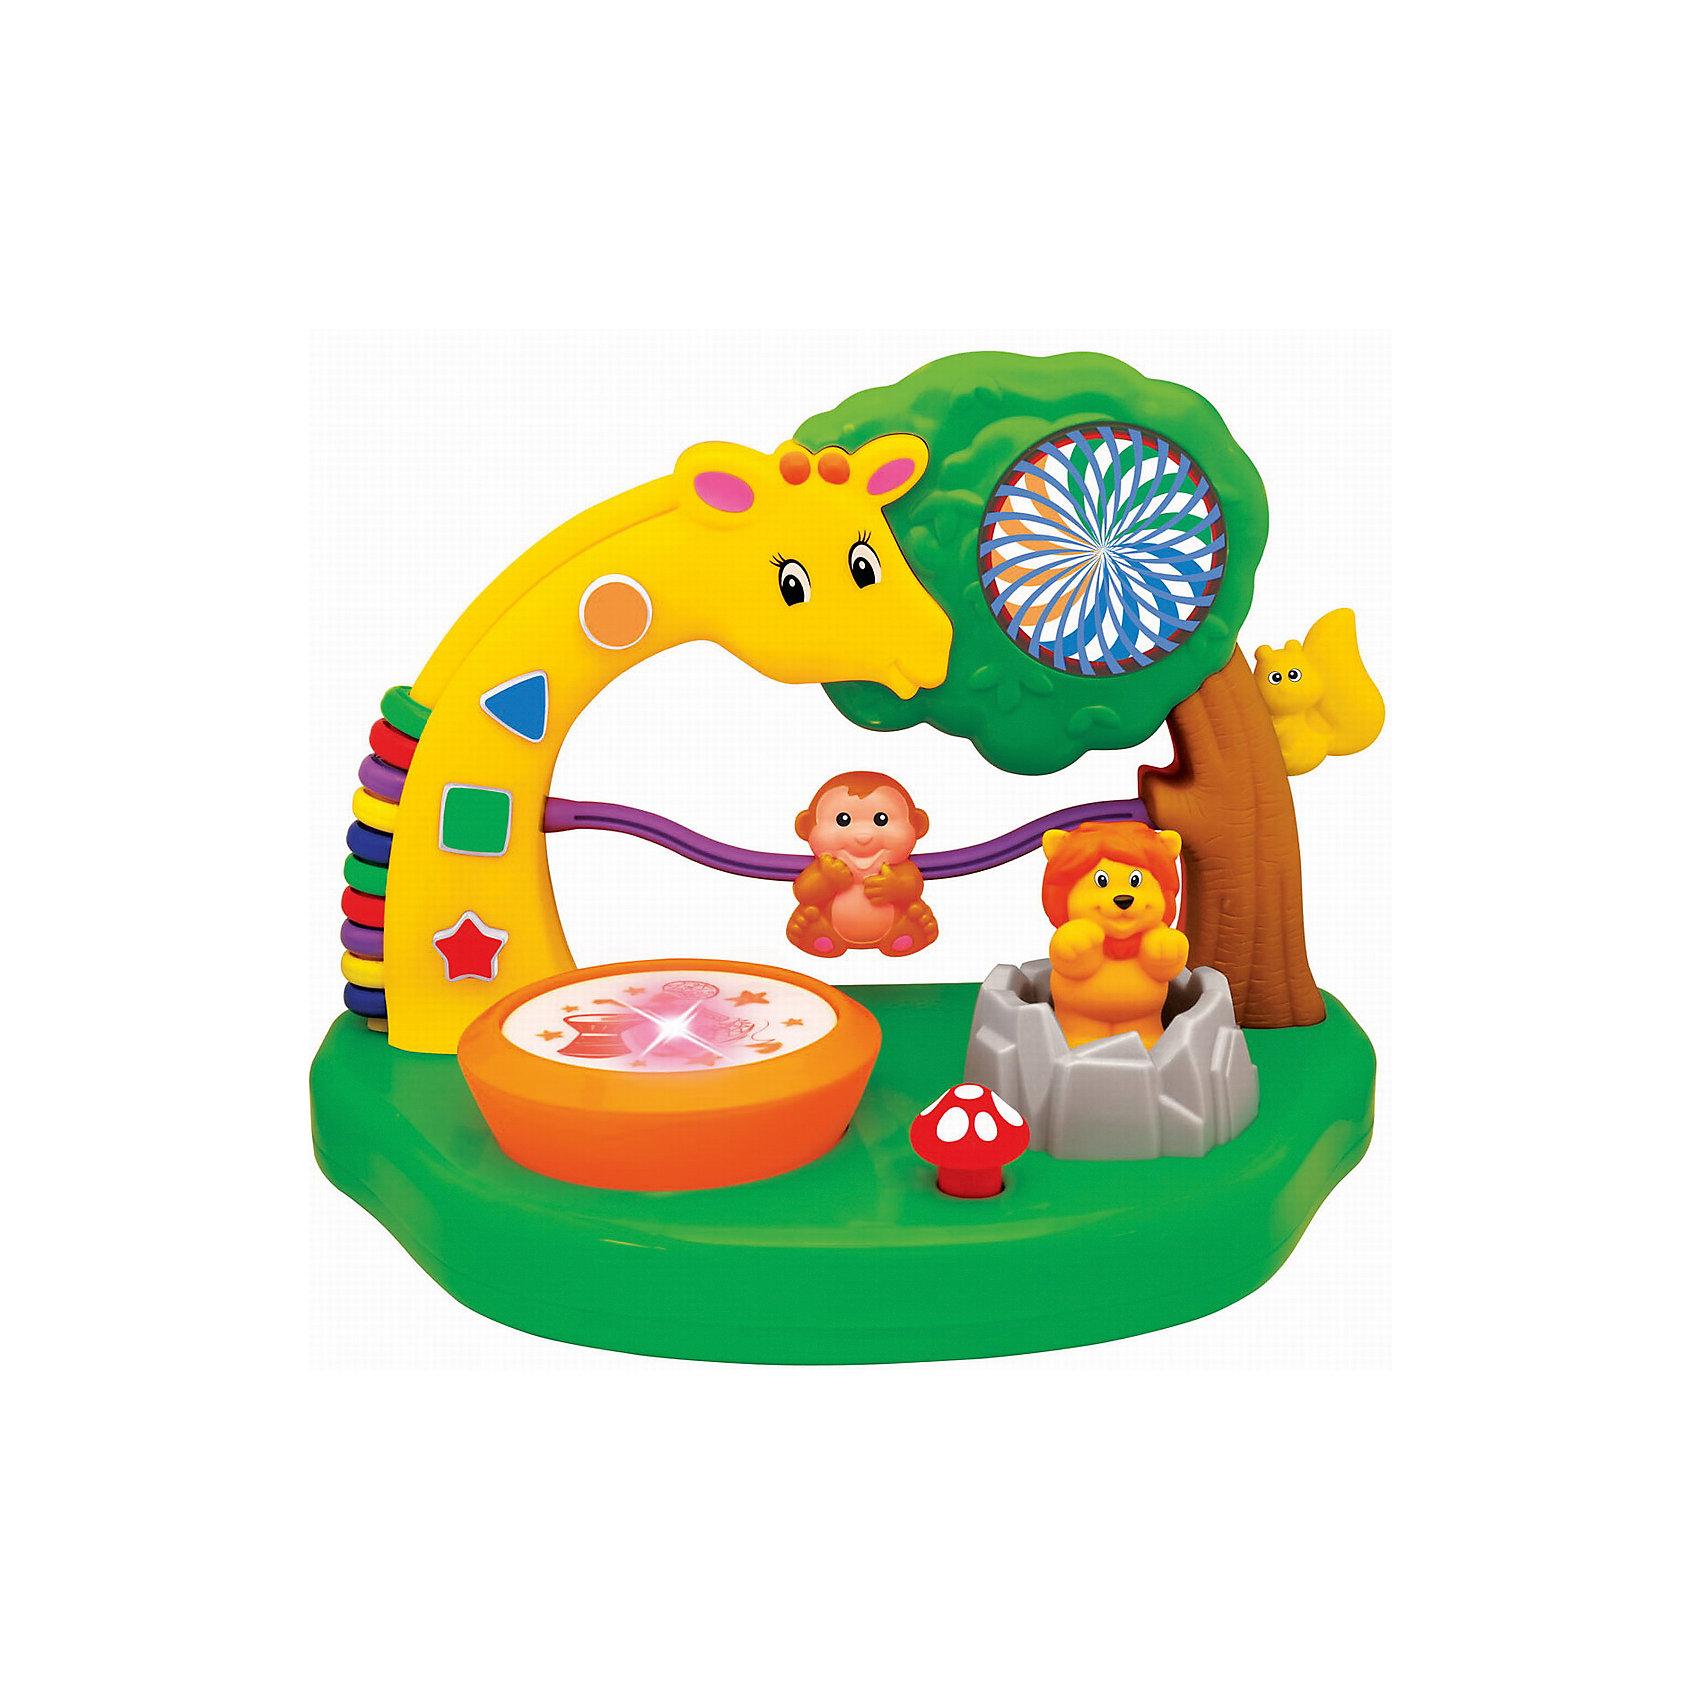 Kiddieland Развивающая игрушка Сафари парк, Kiddieland